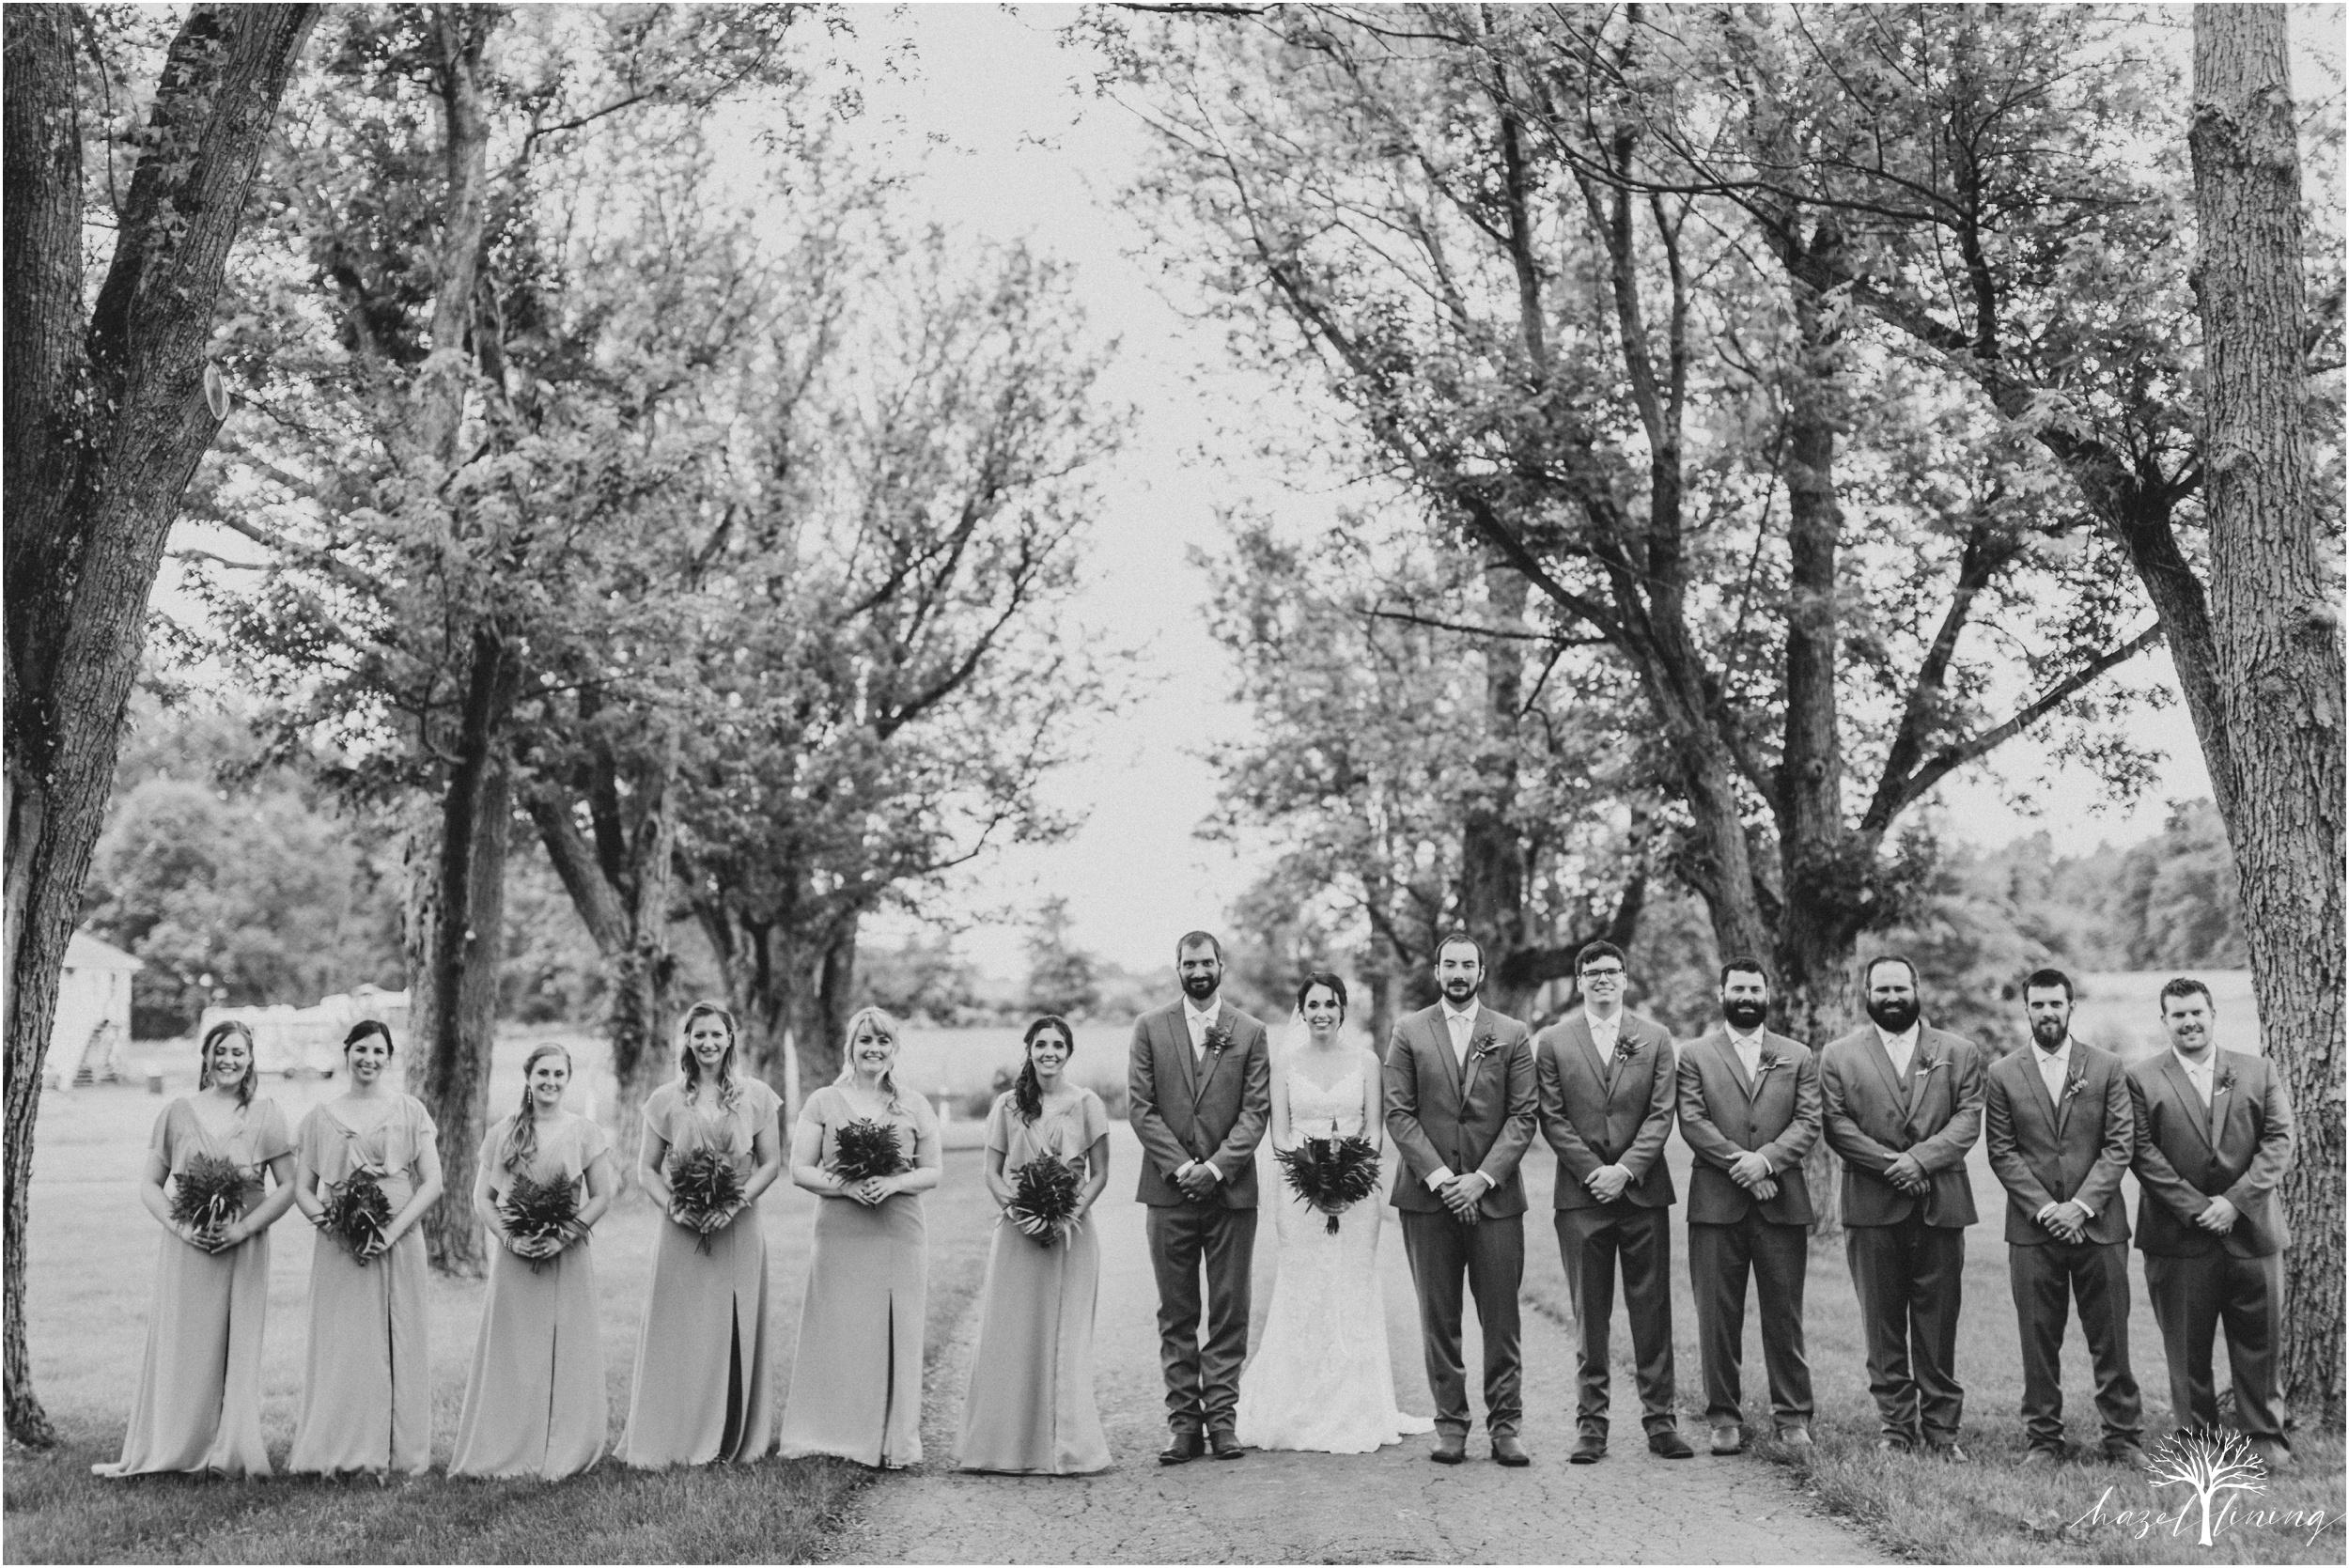 hazel-lining-travel-wedding-elopement-photography-lisa-landon-shoemaker-the-farm-bakery-and-events-bucks-county-quakertown-pennsylvania-summer-country-outdoor-farm-wedding_0072.jpg